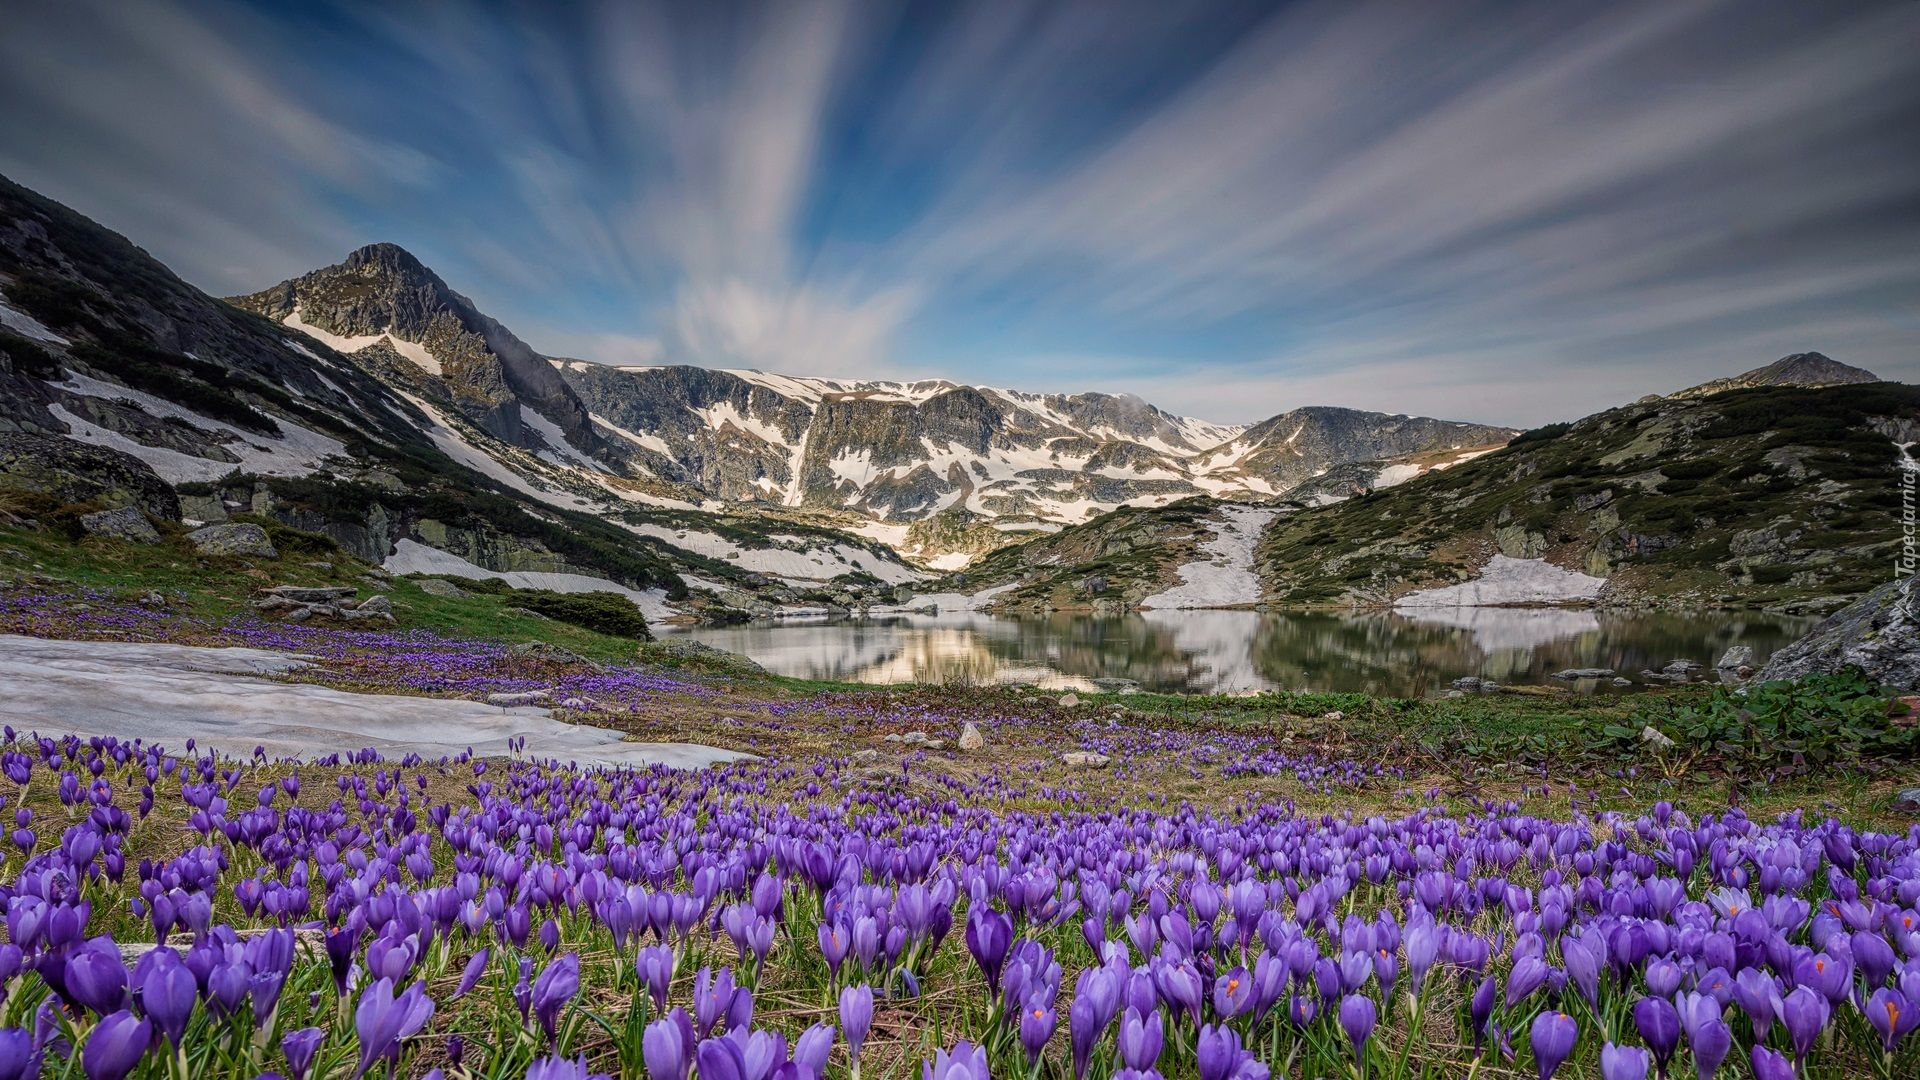 Wiosna Gory Jezioro Fioletowe Krokusy Nature Photography Nature Natural Landmarks